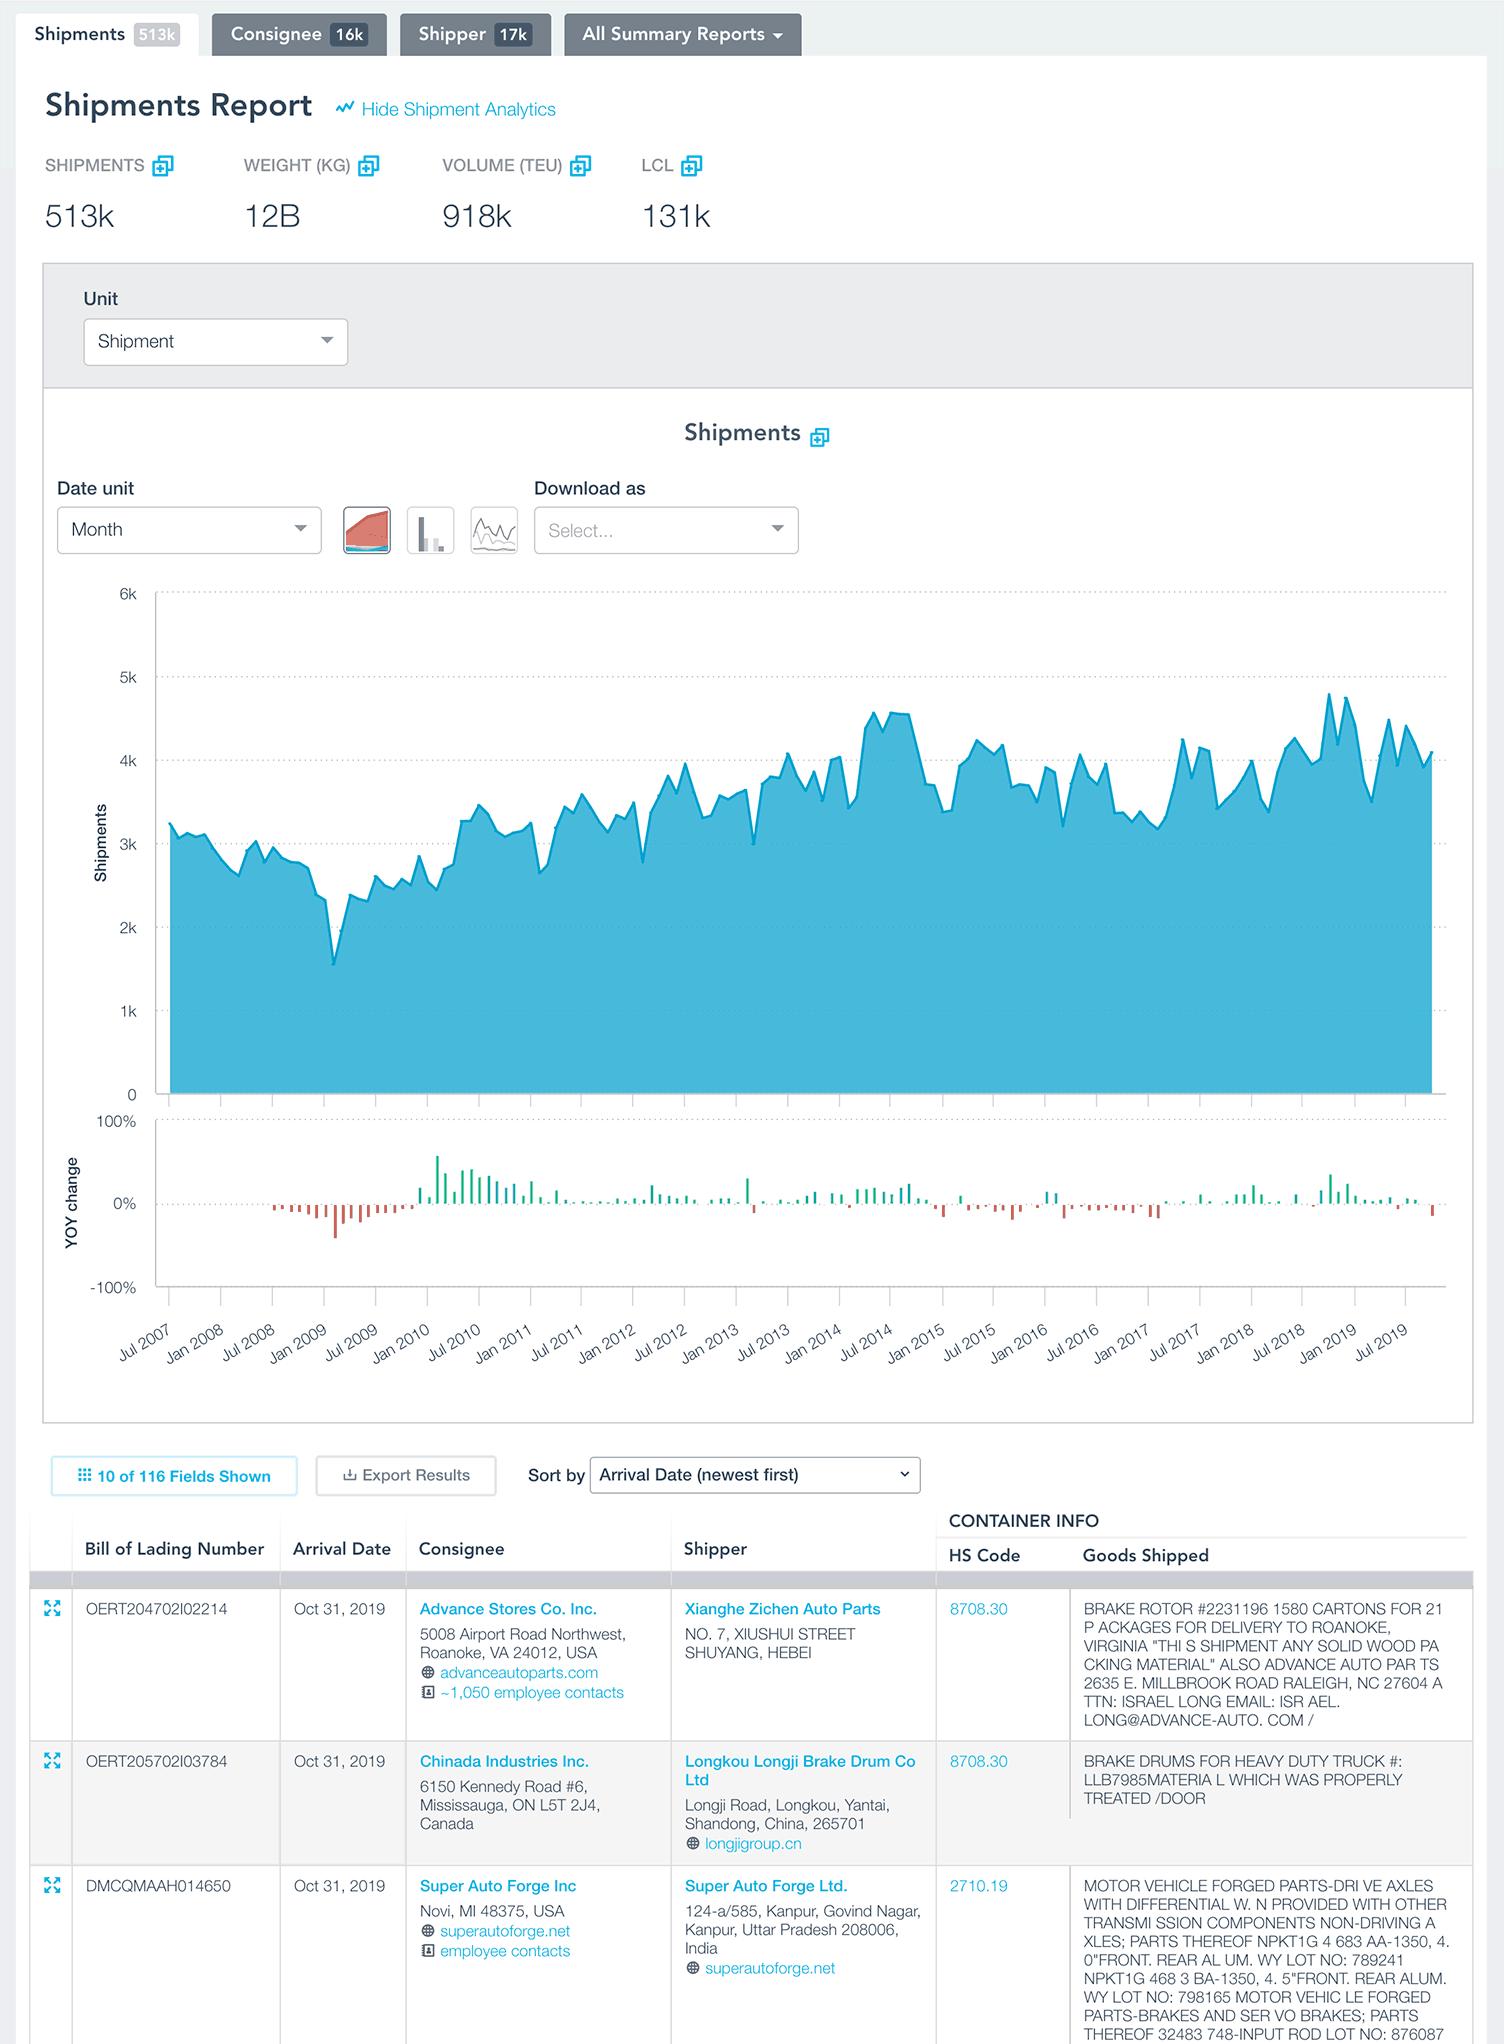 Shipment Analytics for Autos